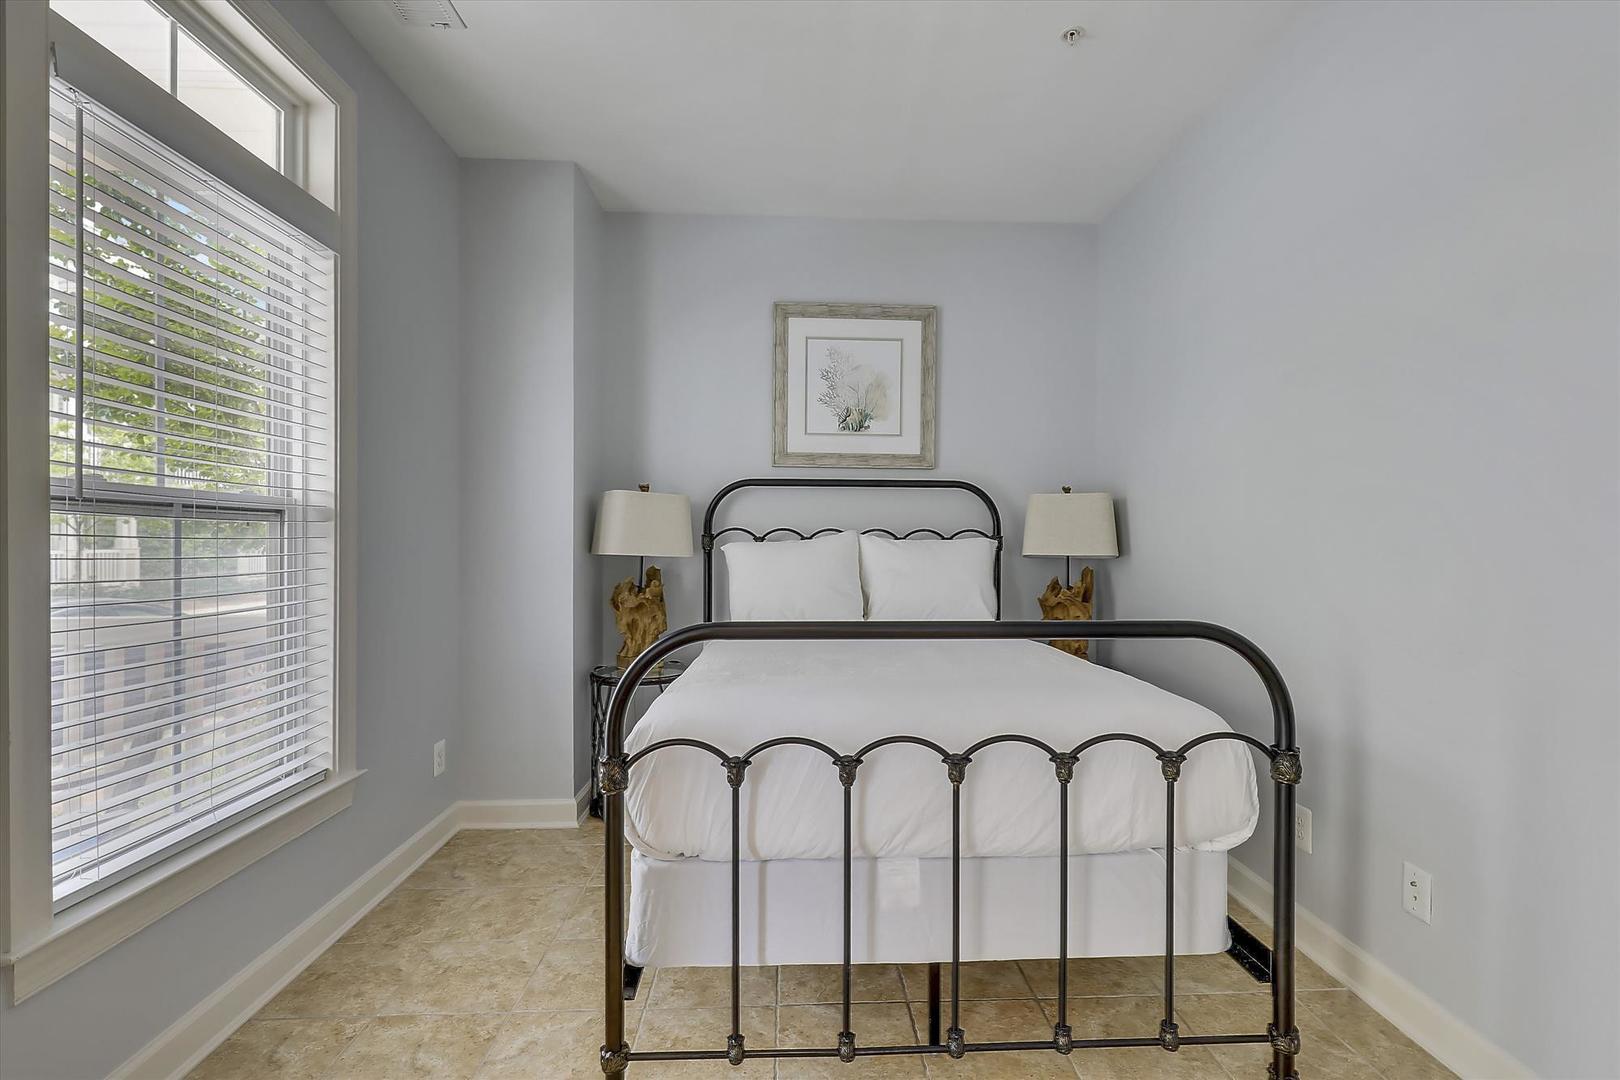 28 Seaside Dr. - First Floor Bedroom